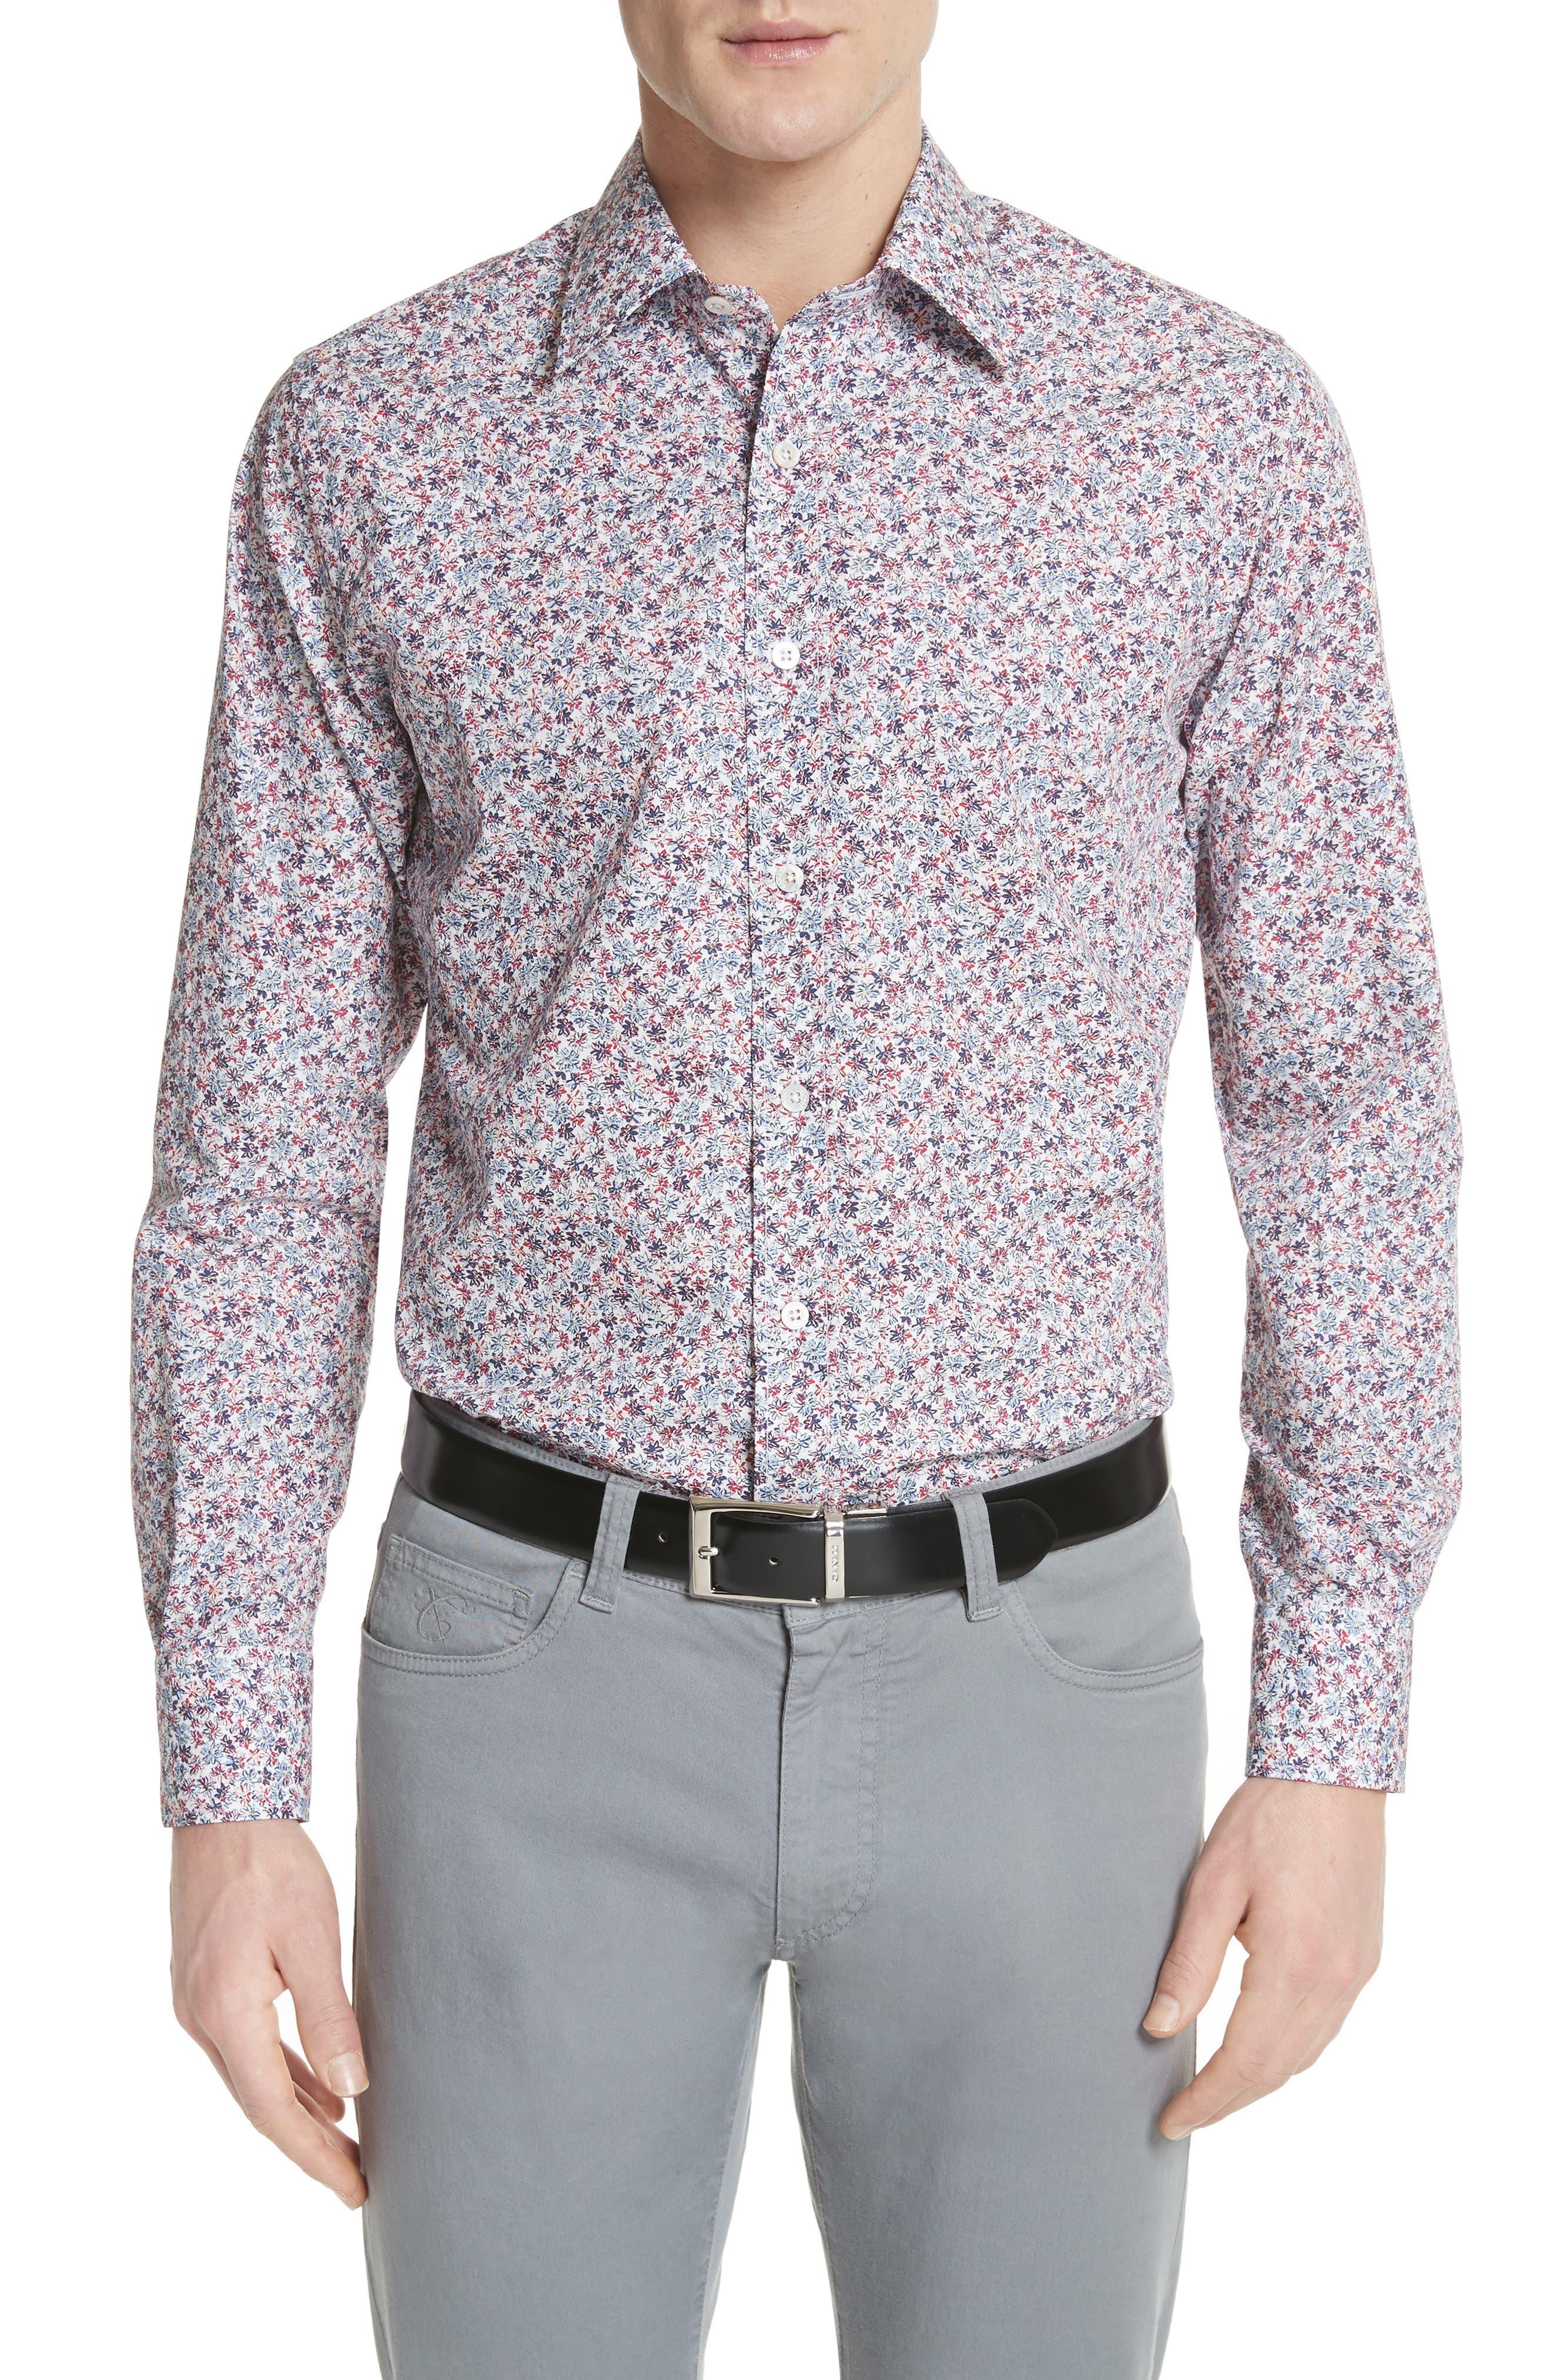 Canali Regular Fit Floral Sport Shirt